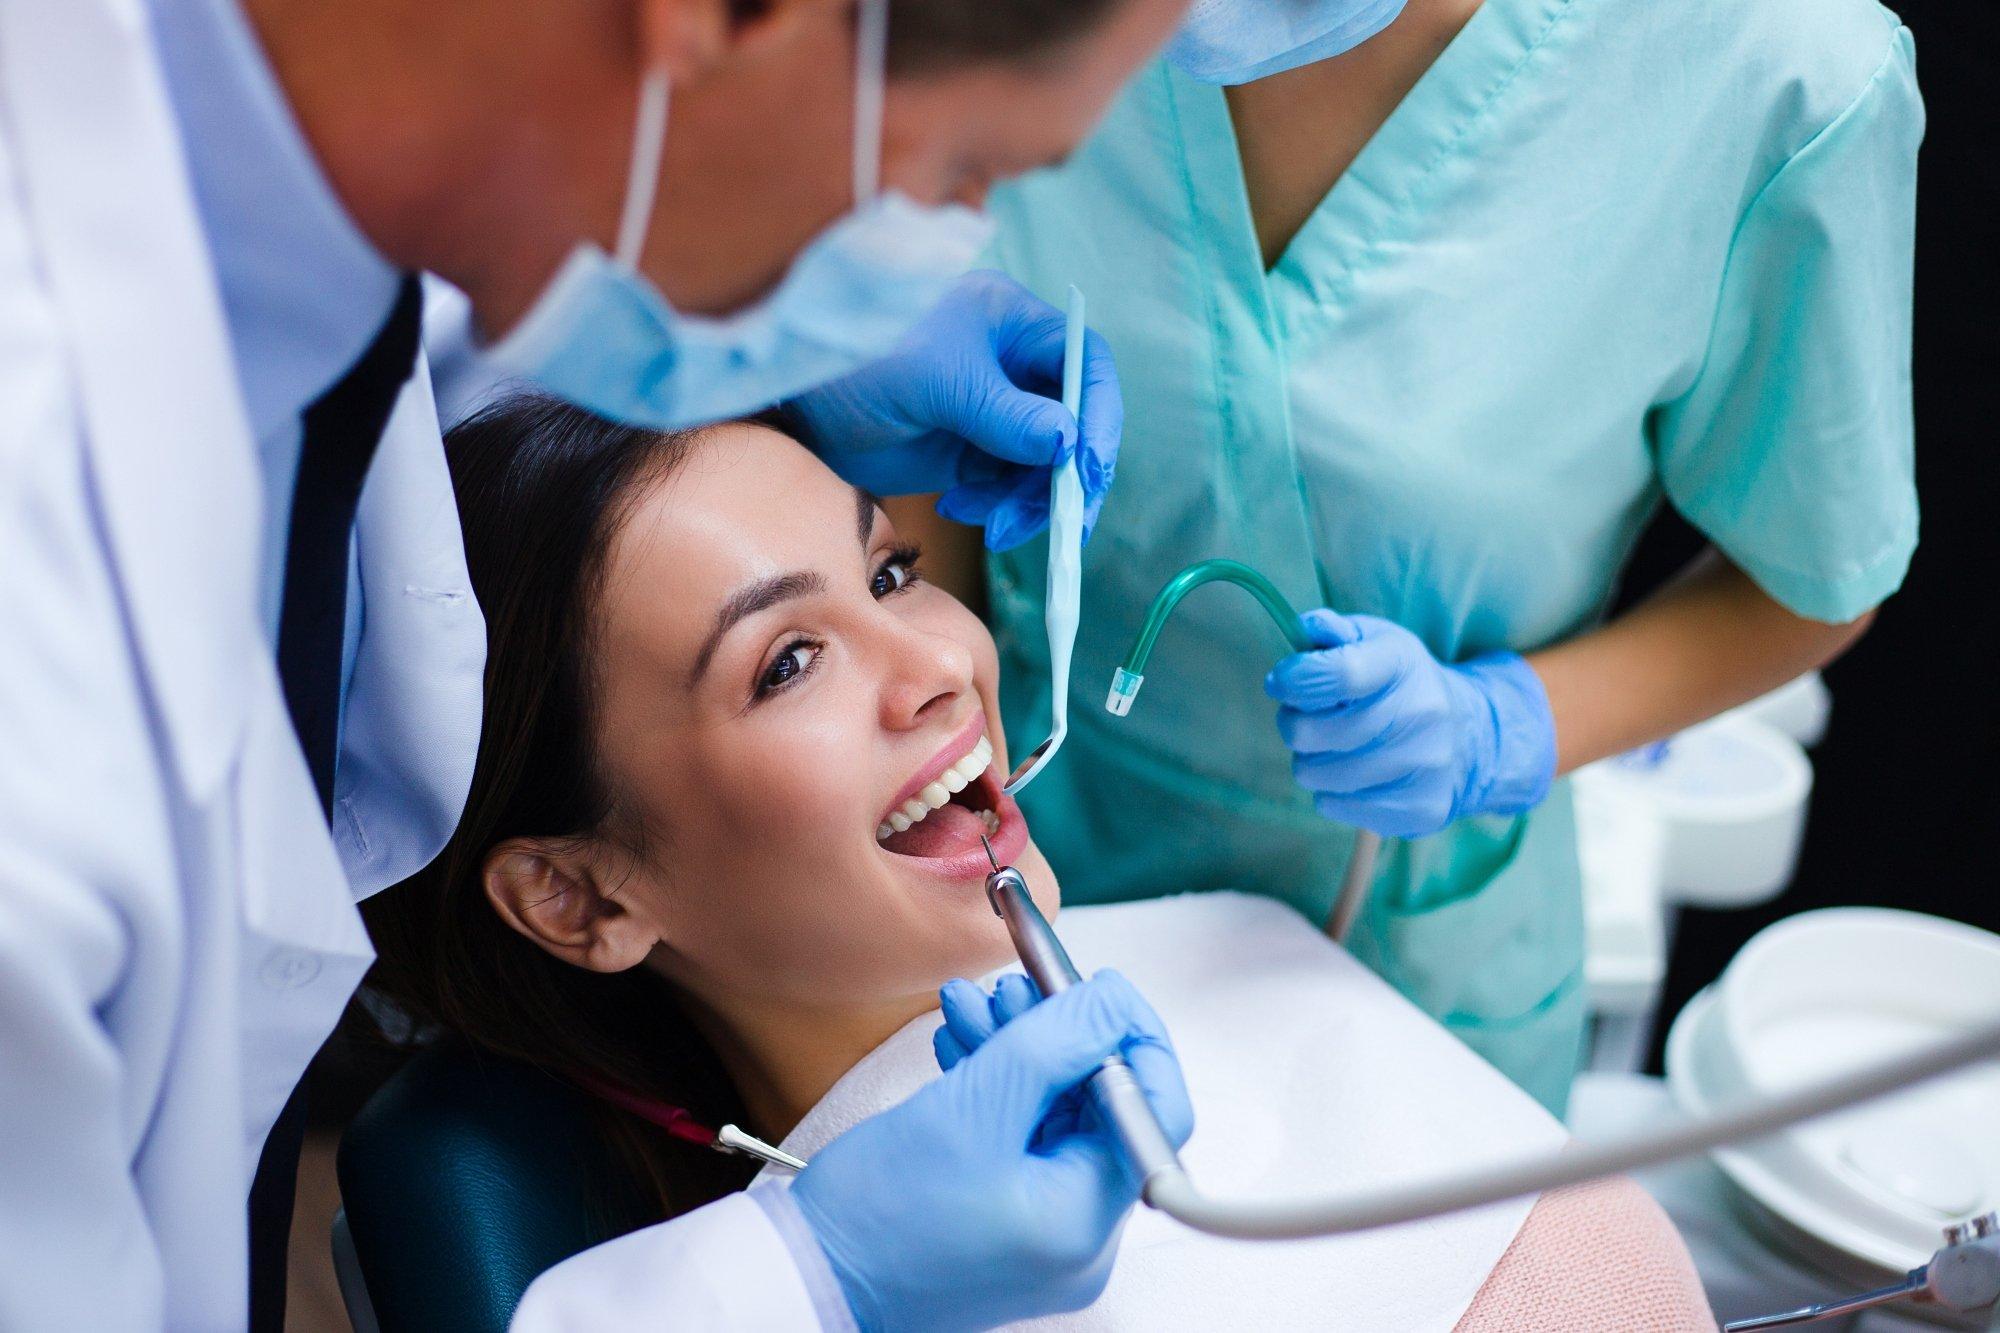 Tips for building dental patient trust